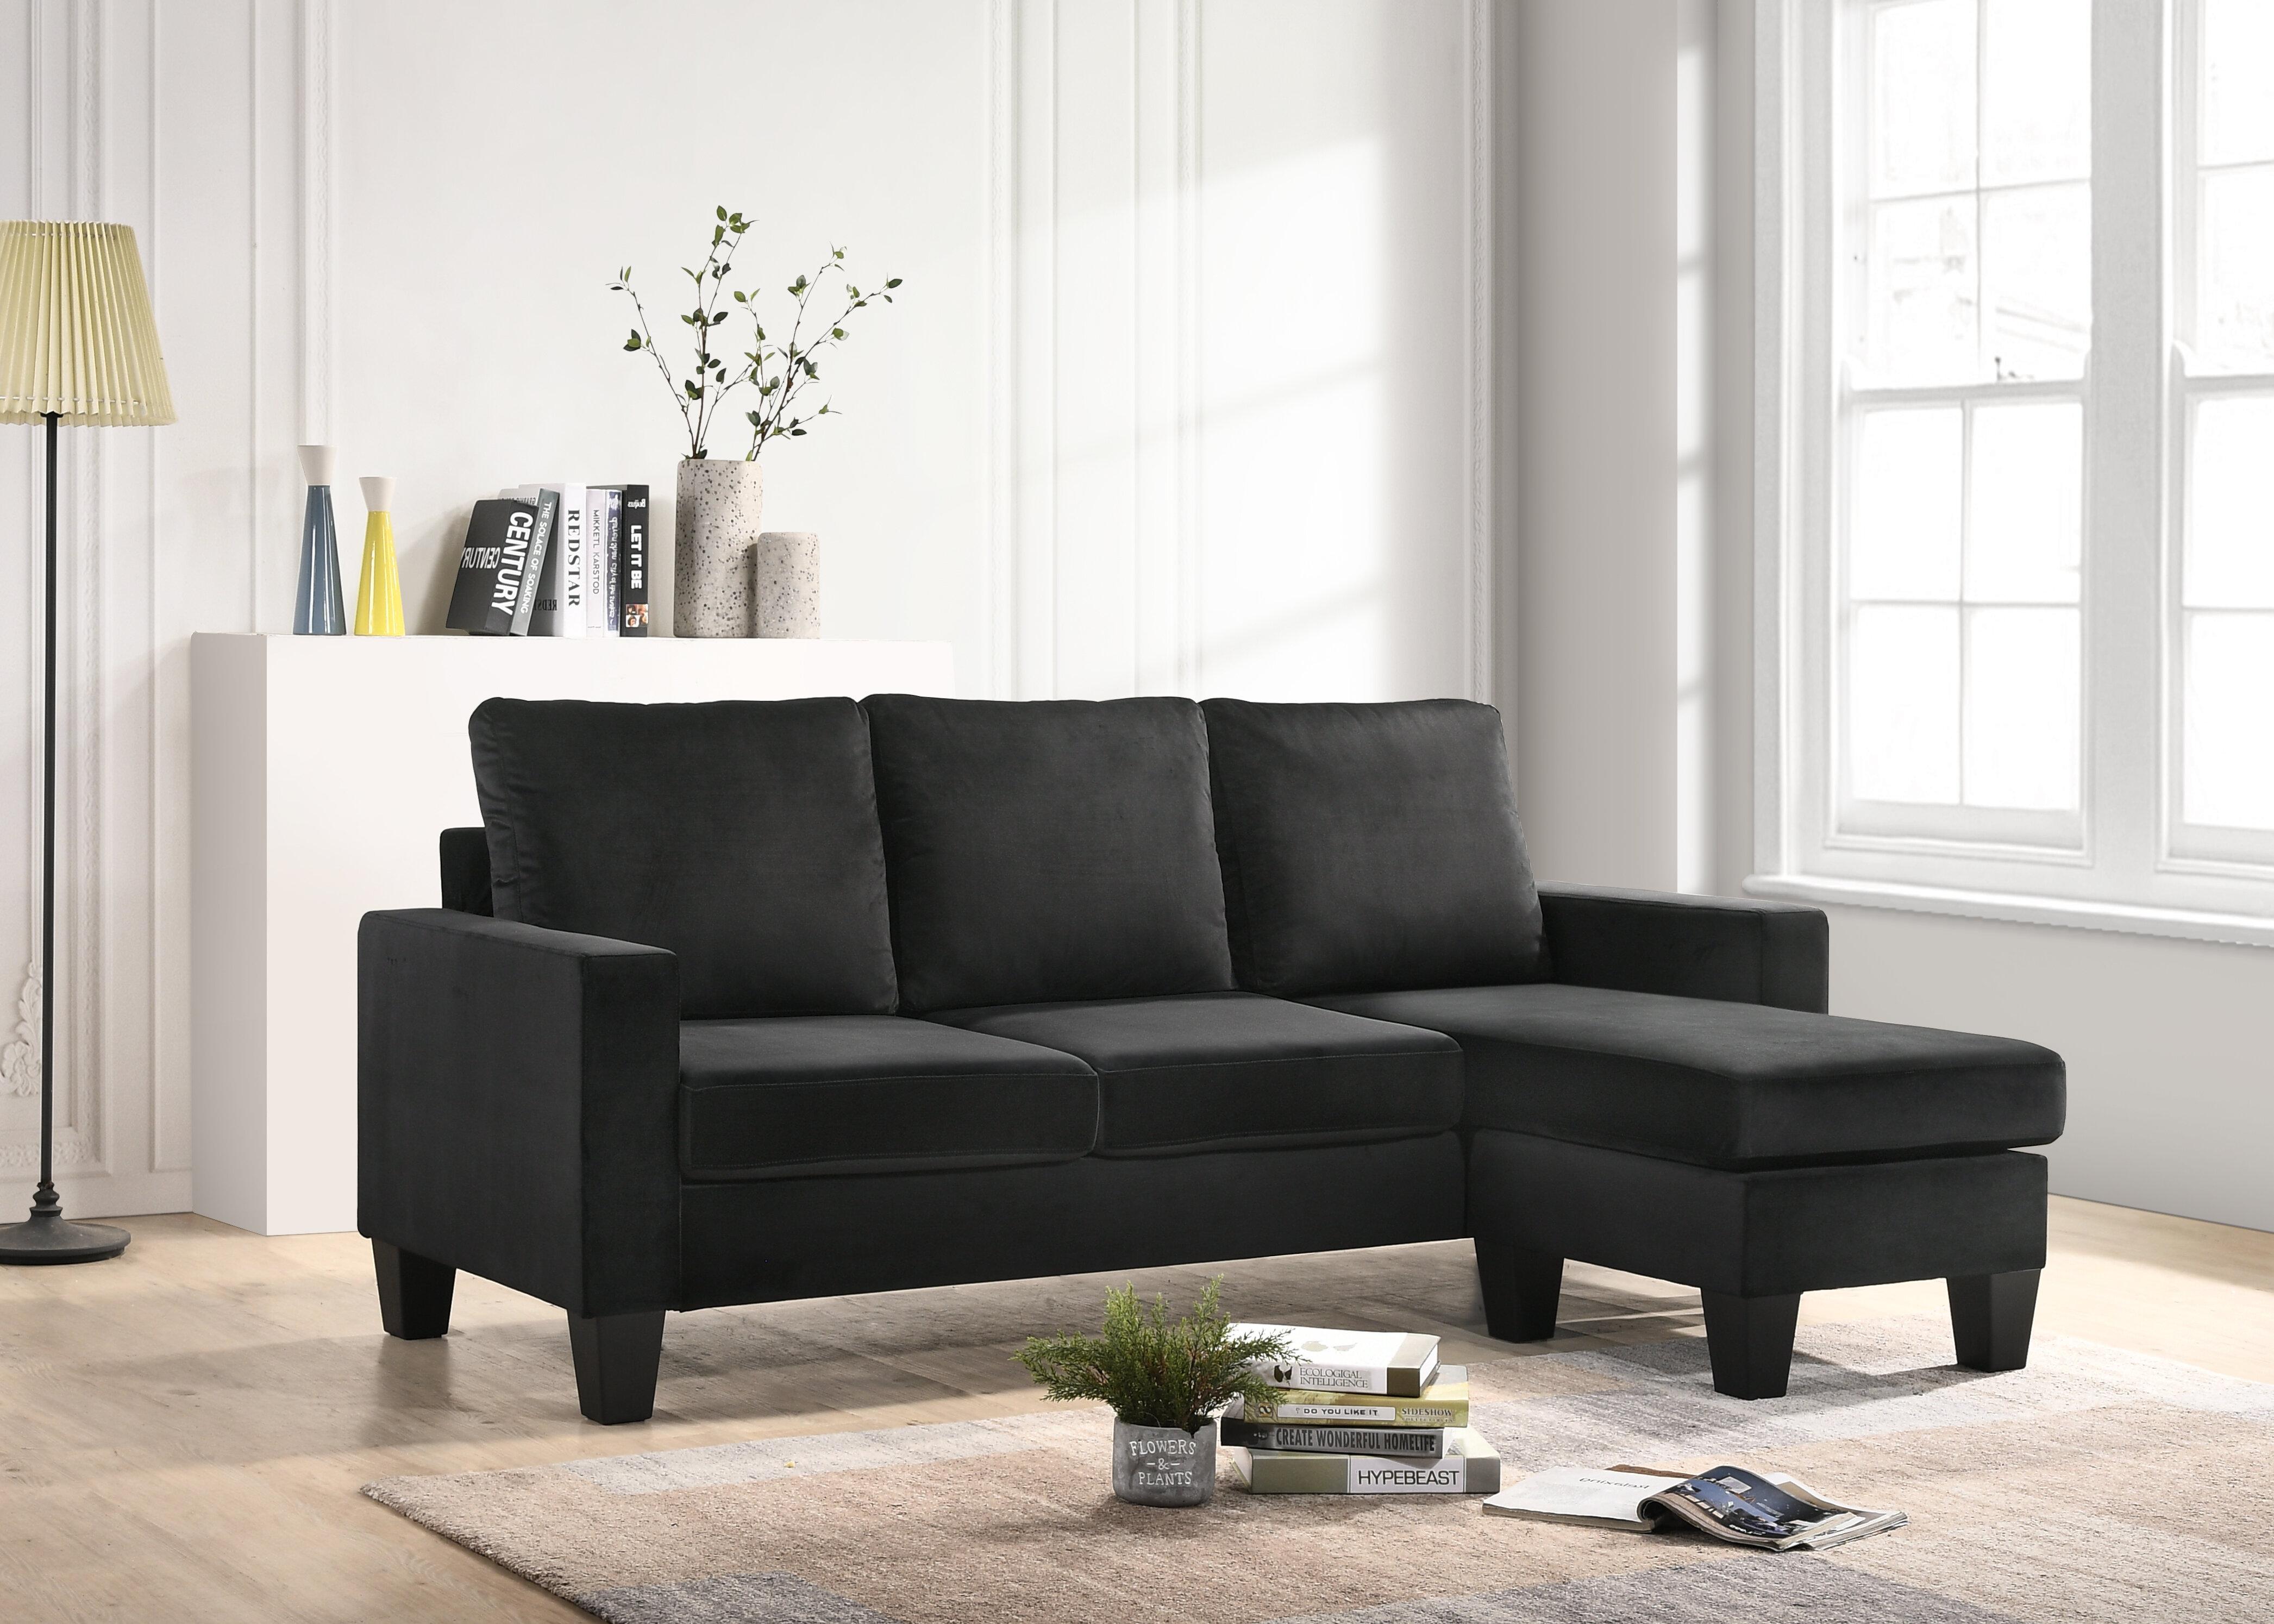 Admirable Bolt Furniture Jessica Reversible Sectional Wayfair Machost Co Dining Chair Design Ideas Machostcouk